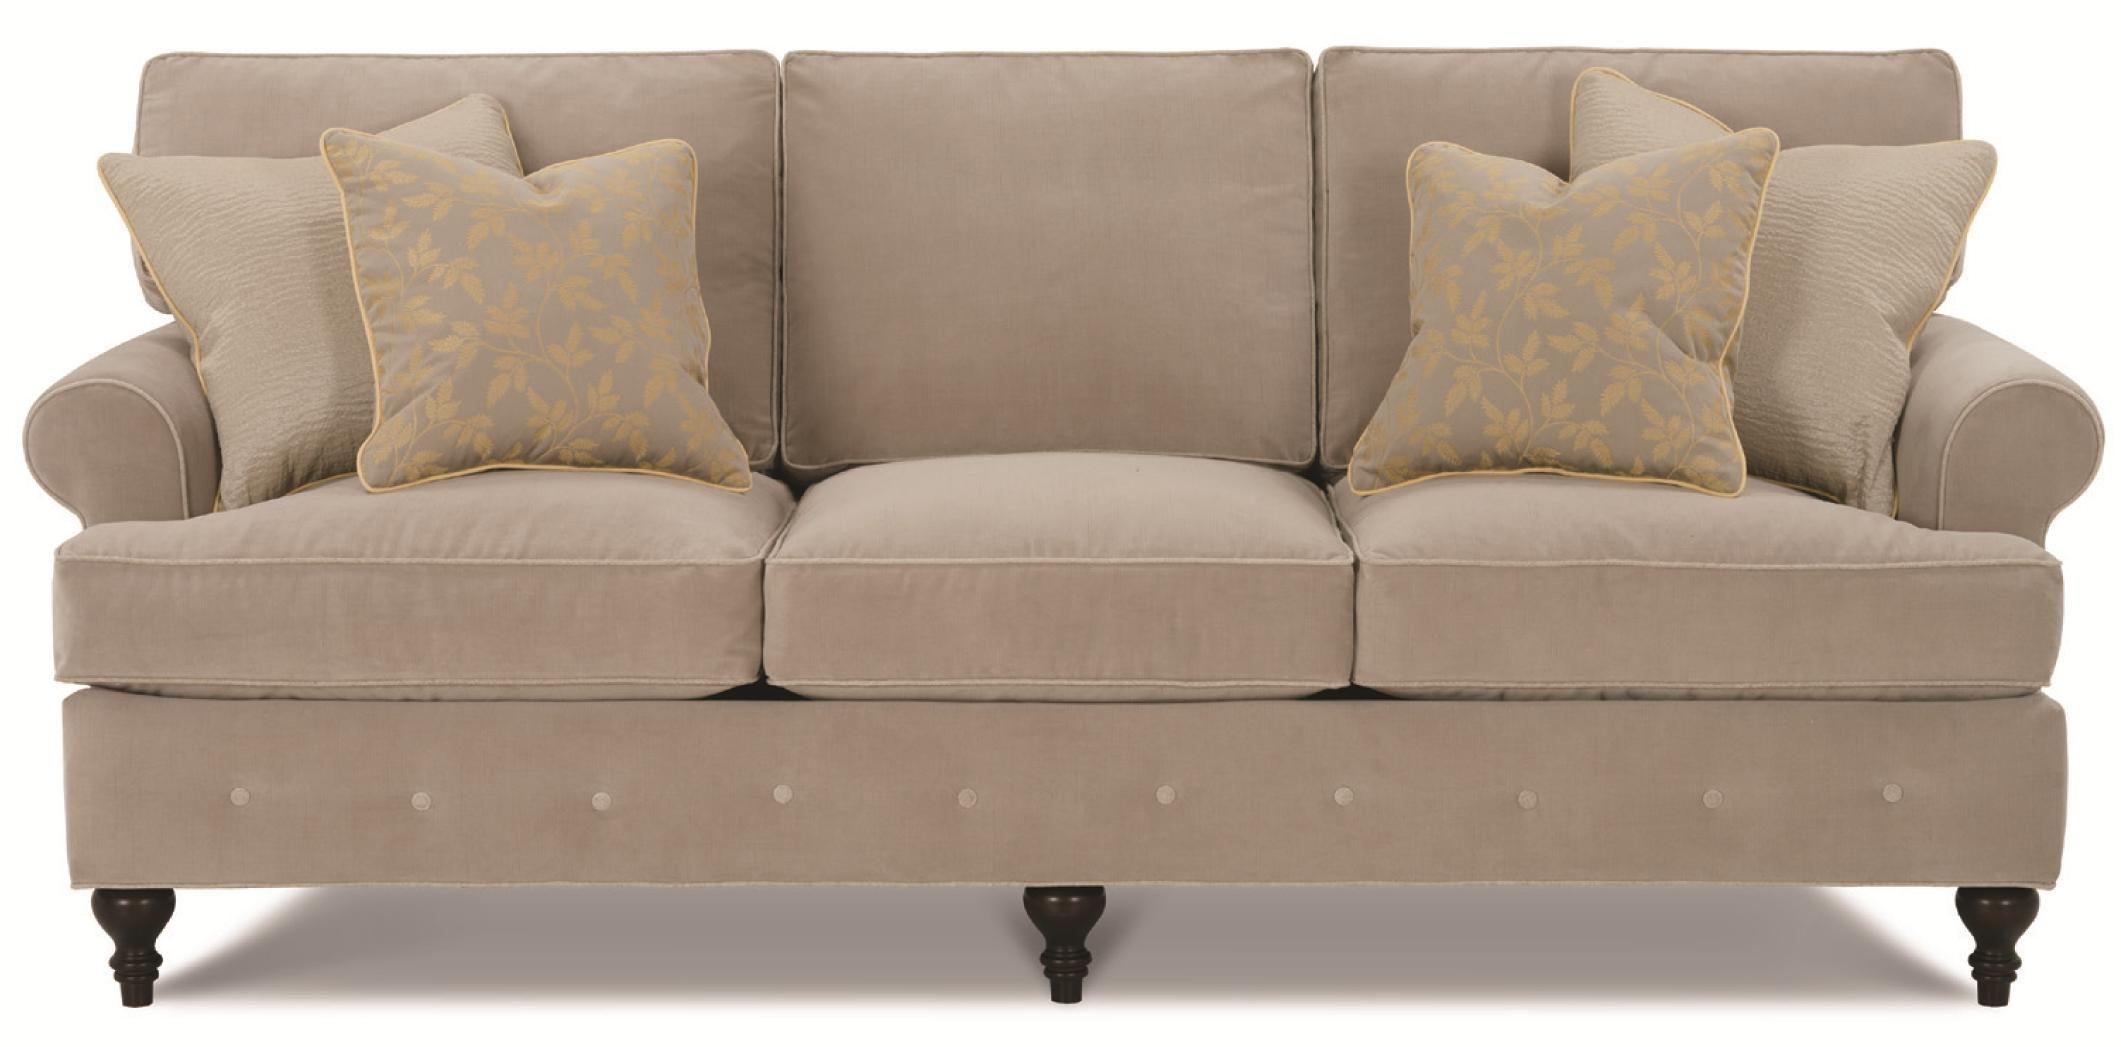 Kensington Collection Gerrard Casual Loose Pillow Back Sofa With